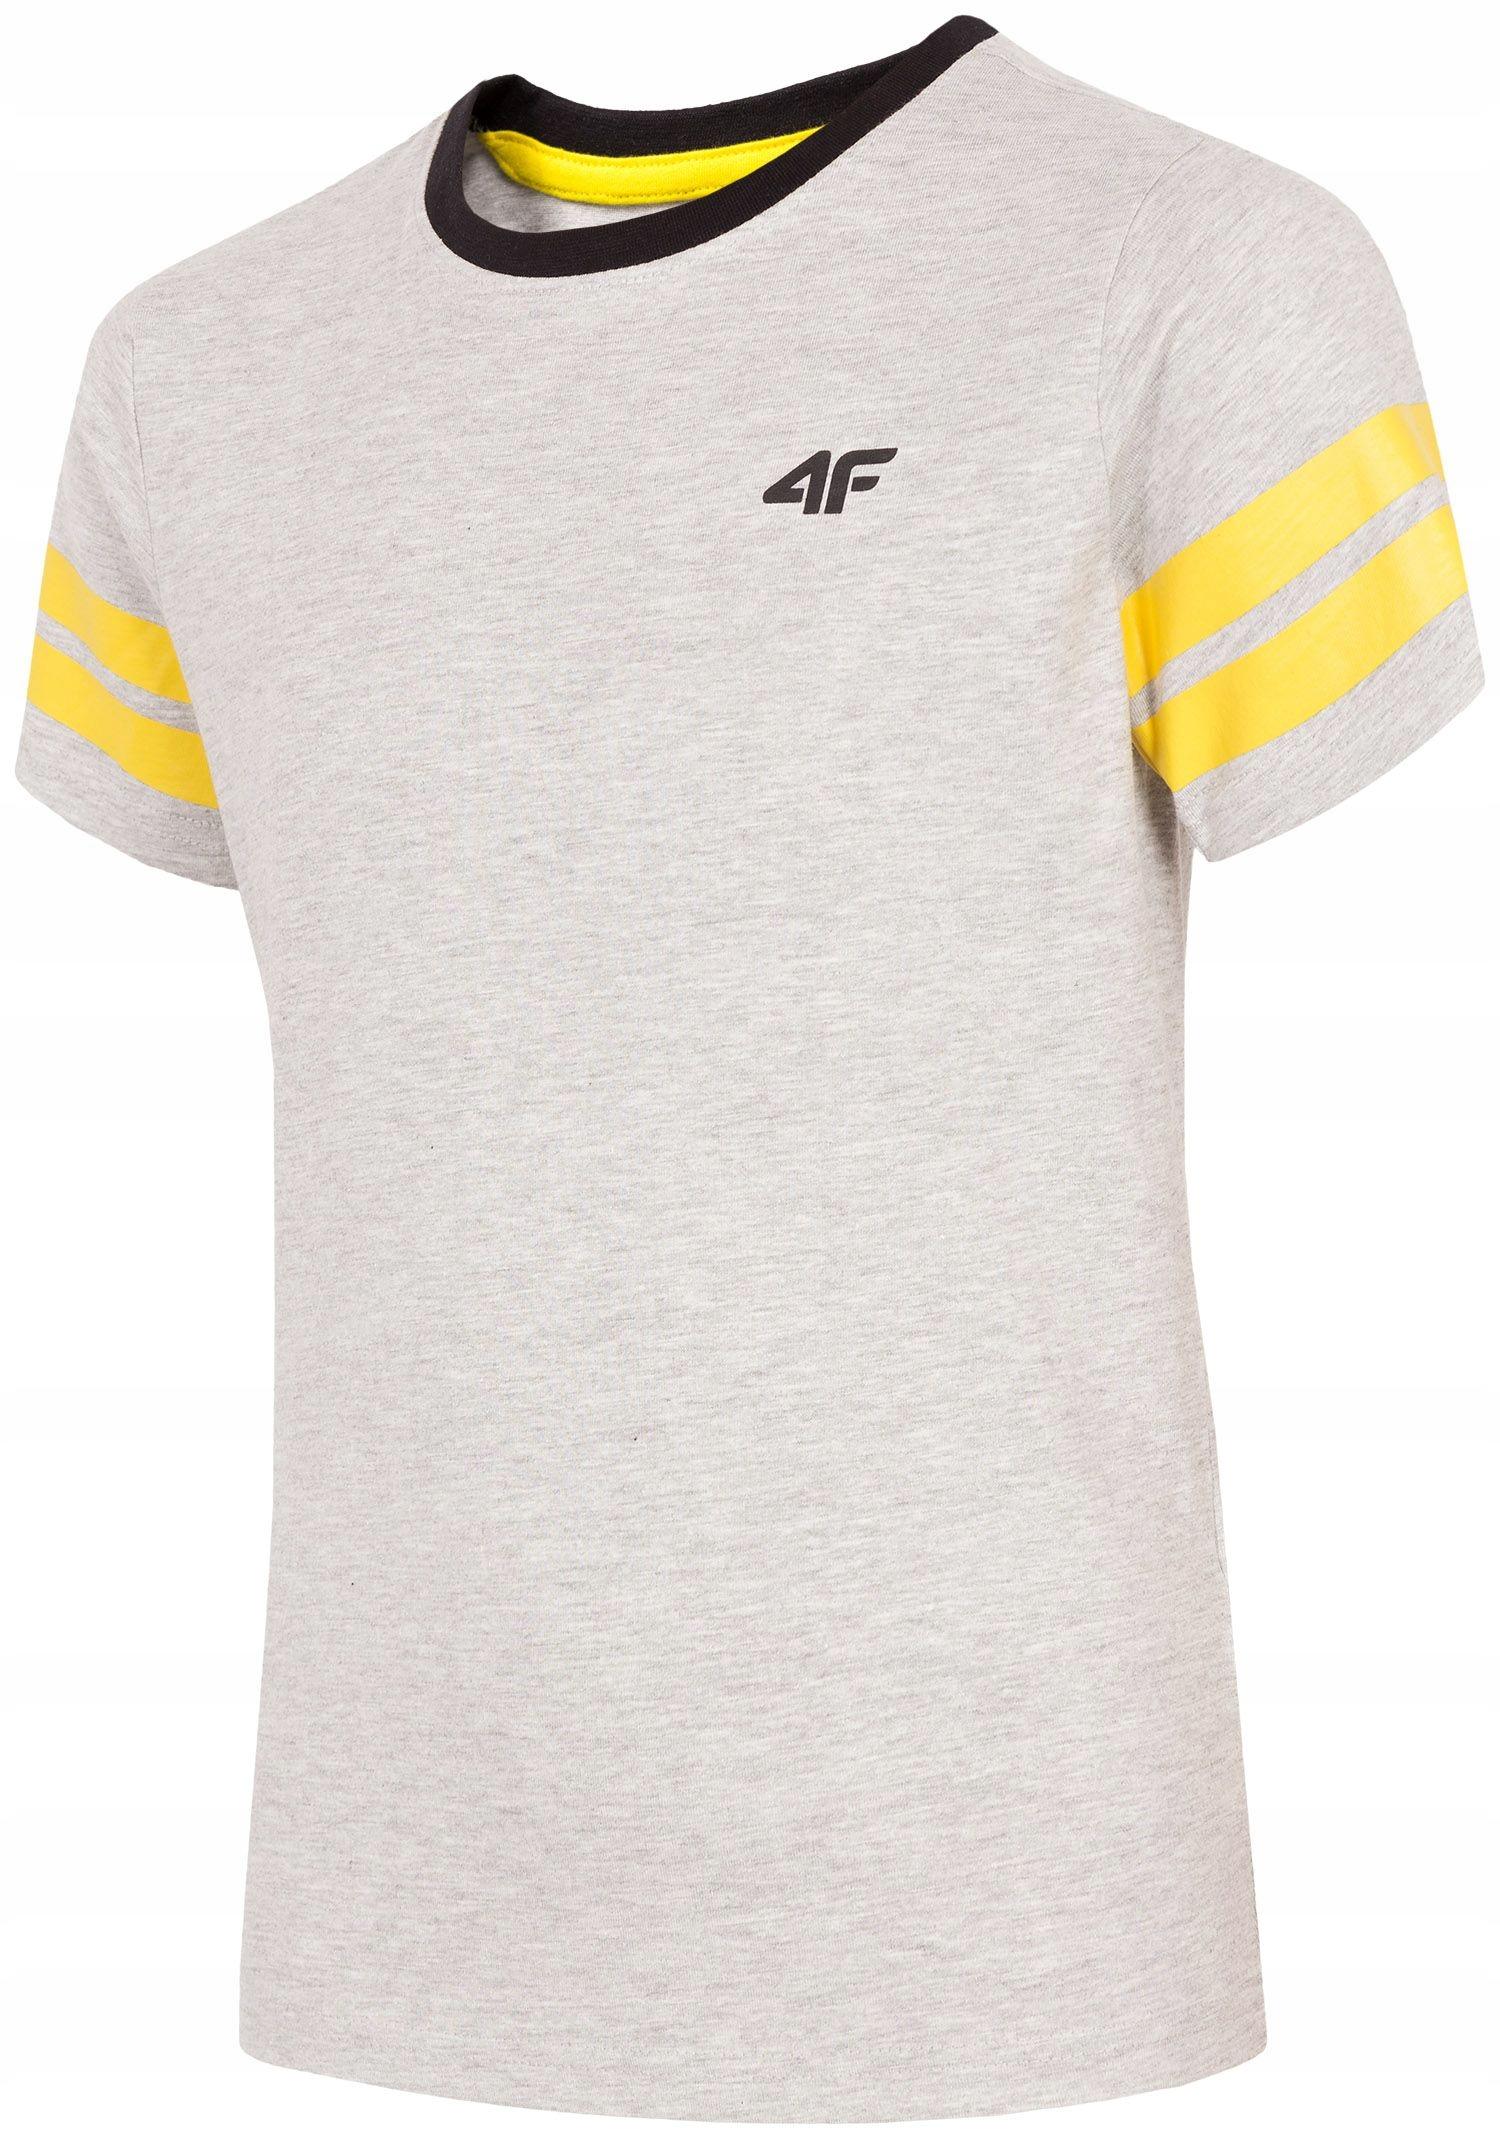 655174ef0 4F koszulka chłopięca t-shirt JTSM202A szary 158 - 7881919140 ...